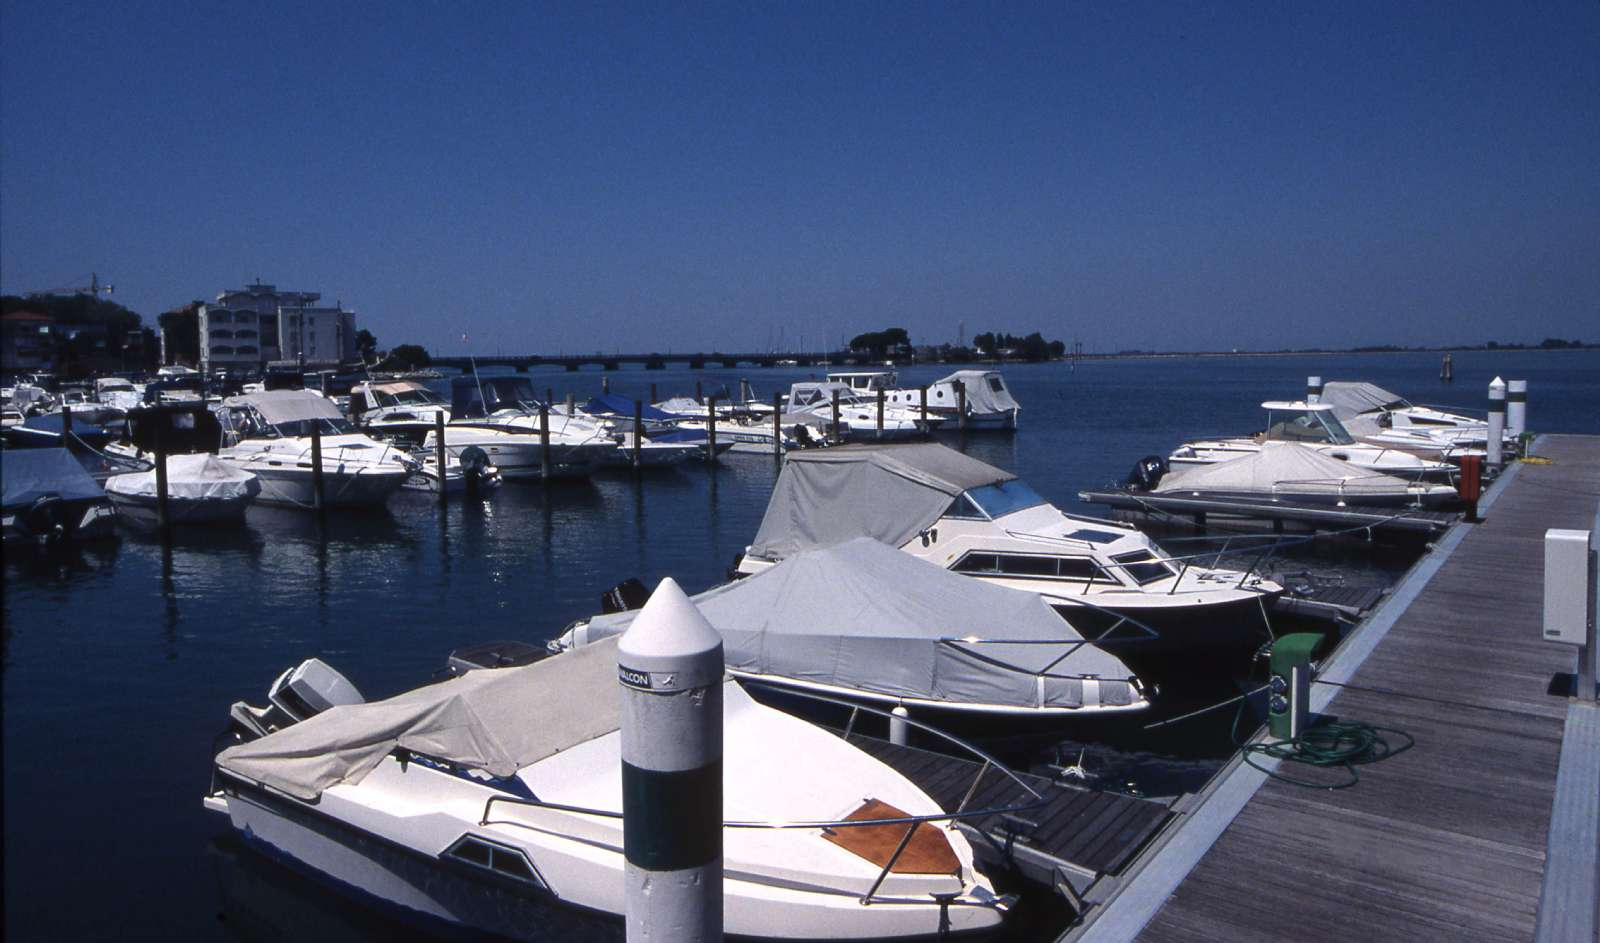 Lystbådehavnen foran hotellet